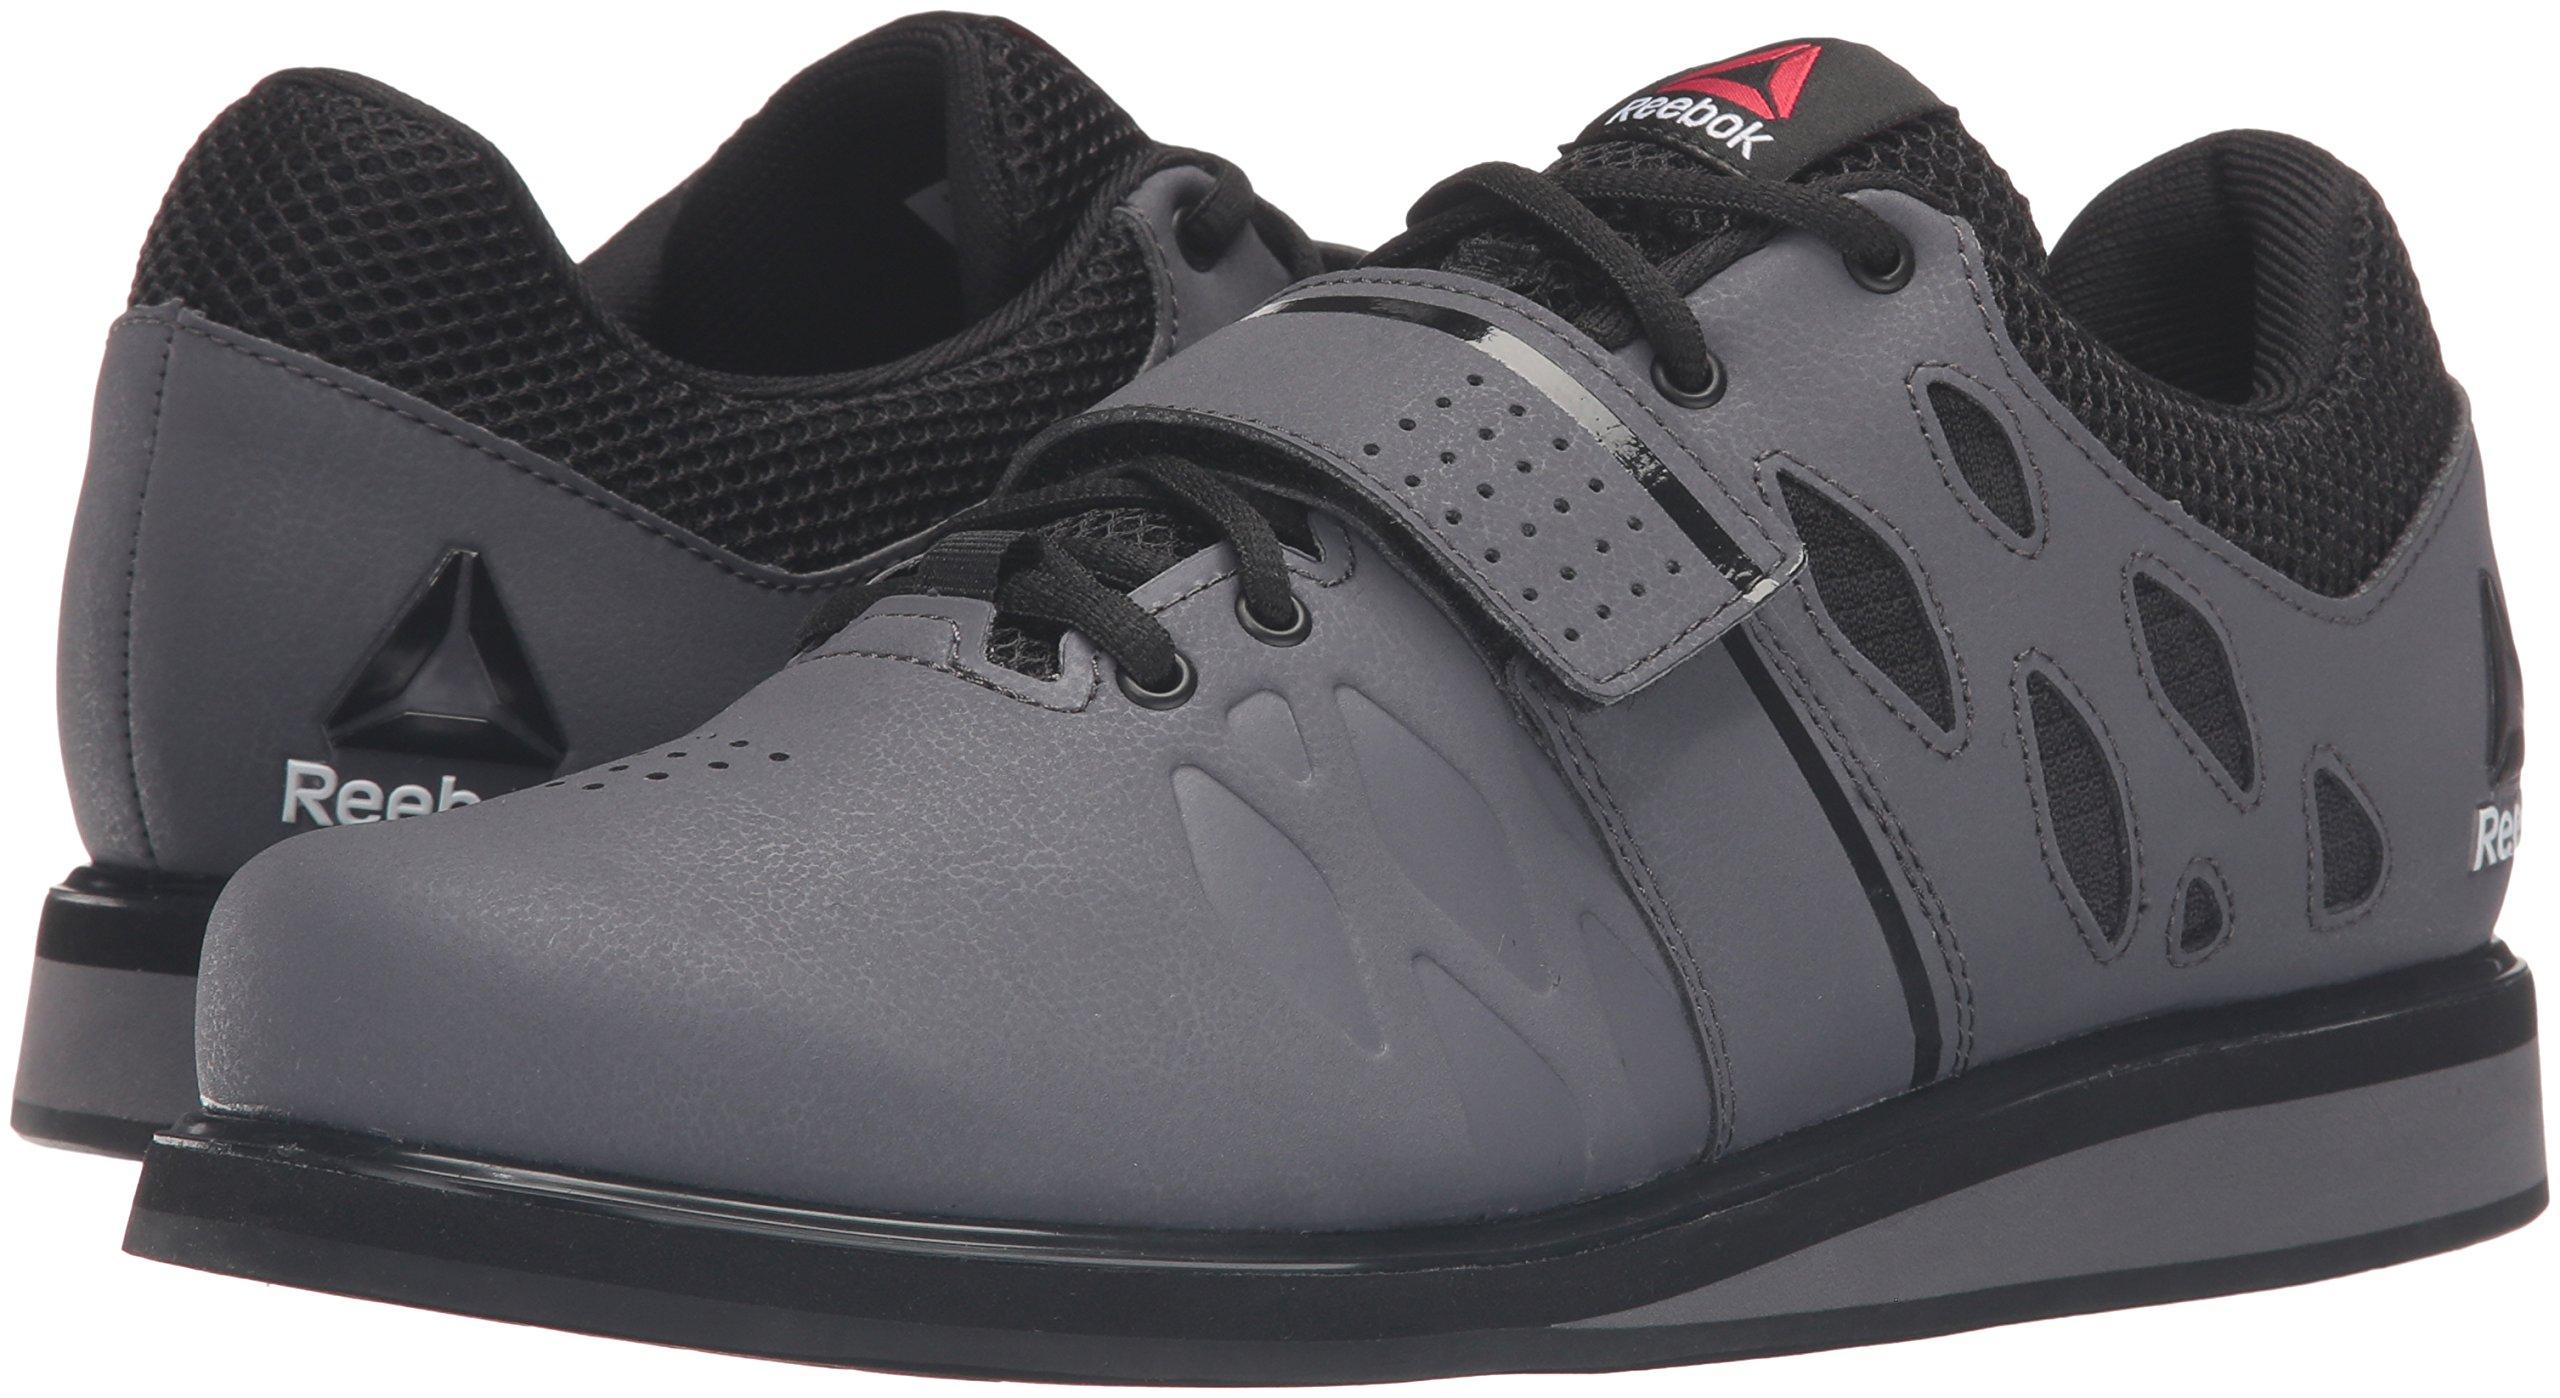 Reebok Men's Lifter Pr Cross-Trainer Shoe, Ash Grey/Black/White, 7 M US by Reebok (Image #6)